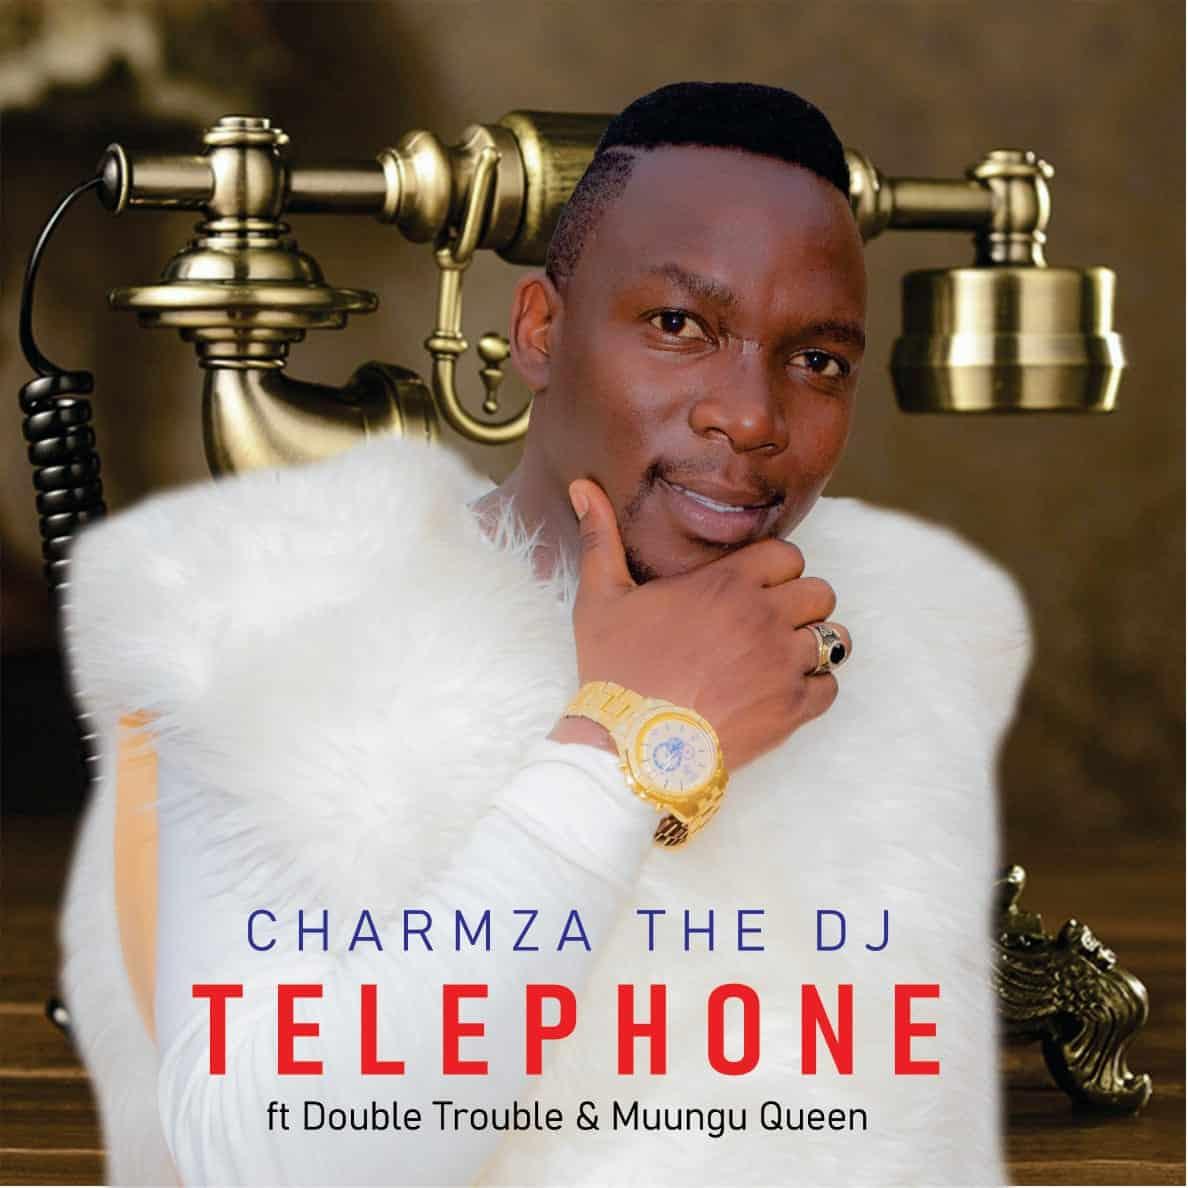 Charmza The DJ - Telephone ft Double Trouble & Muungu Queen